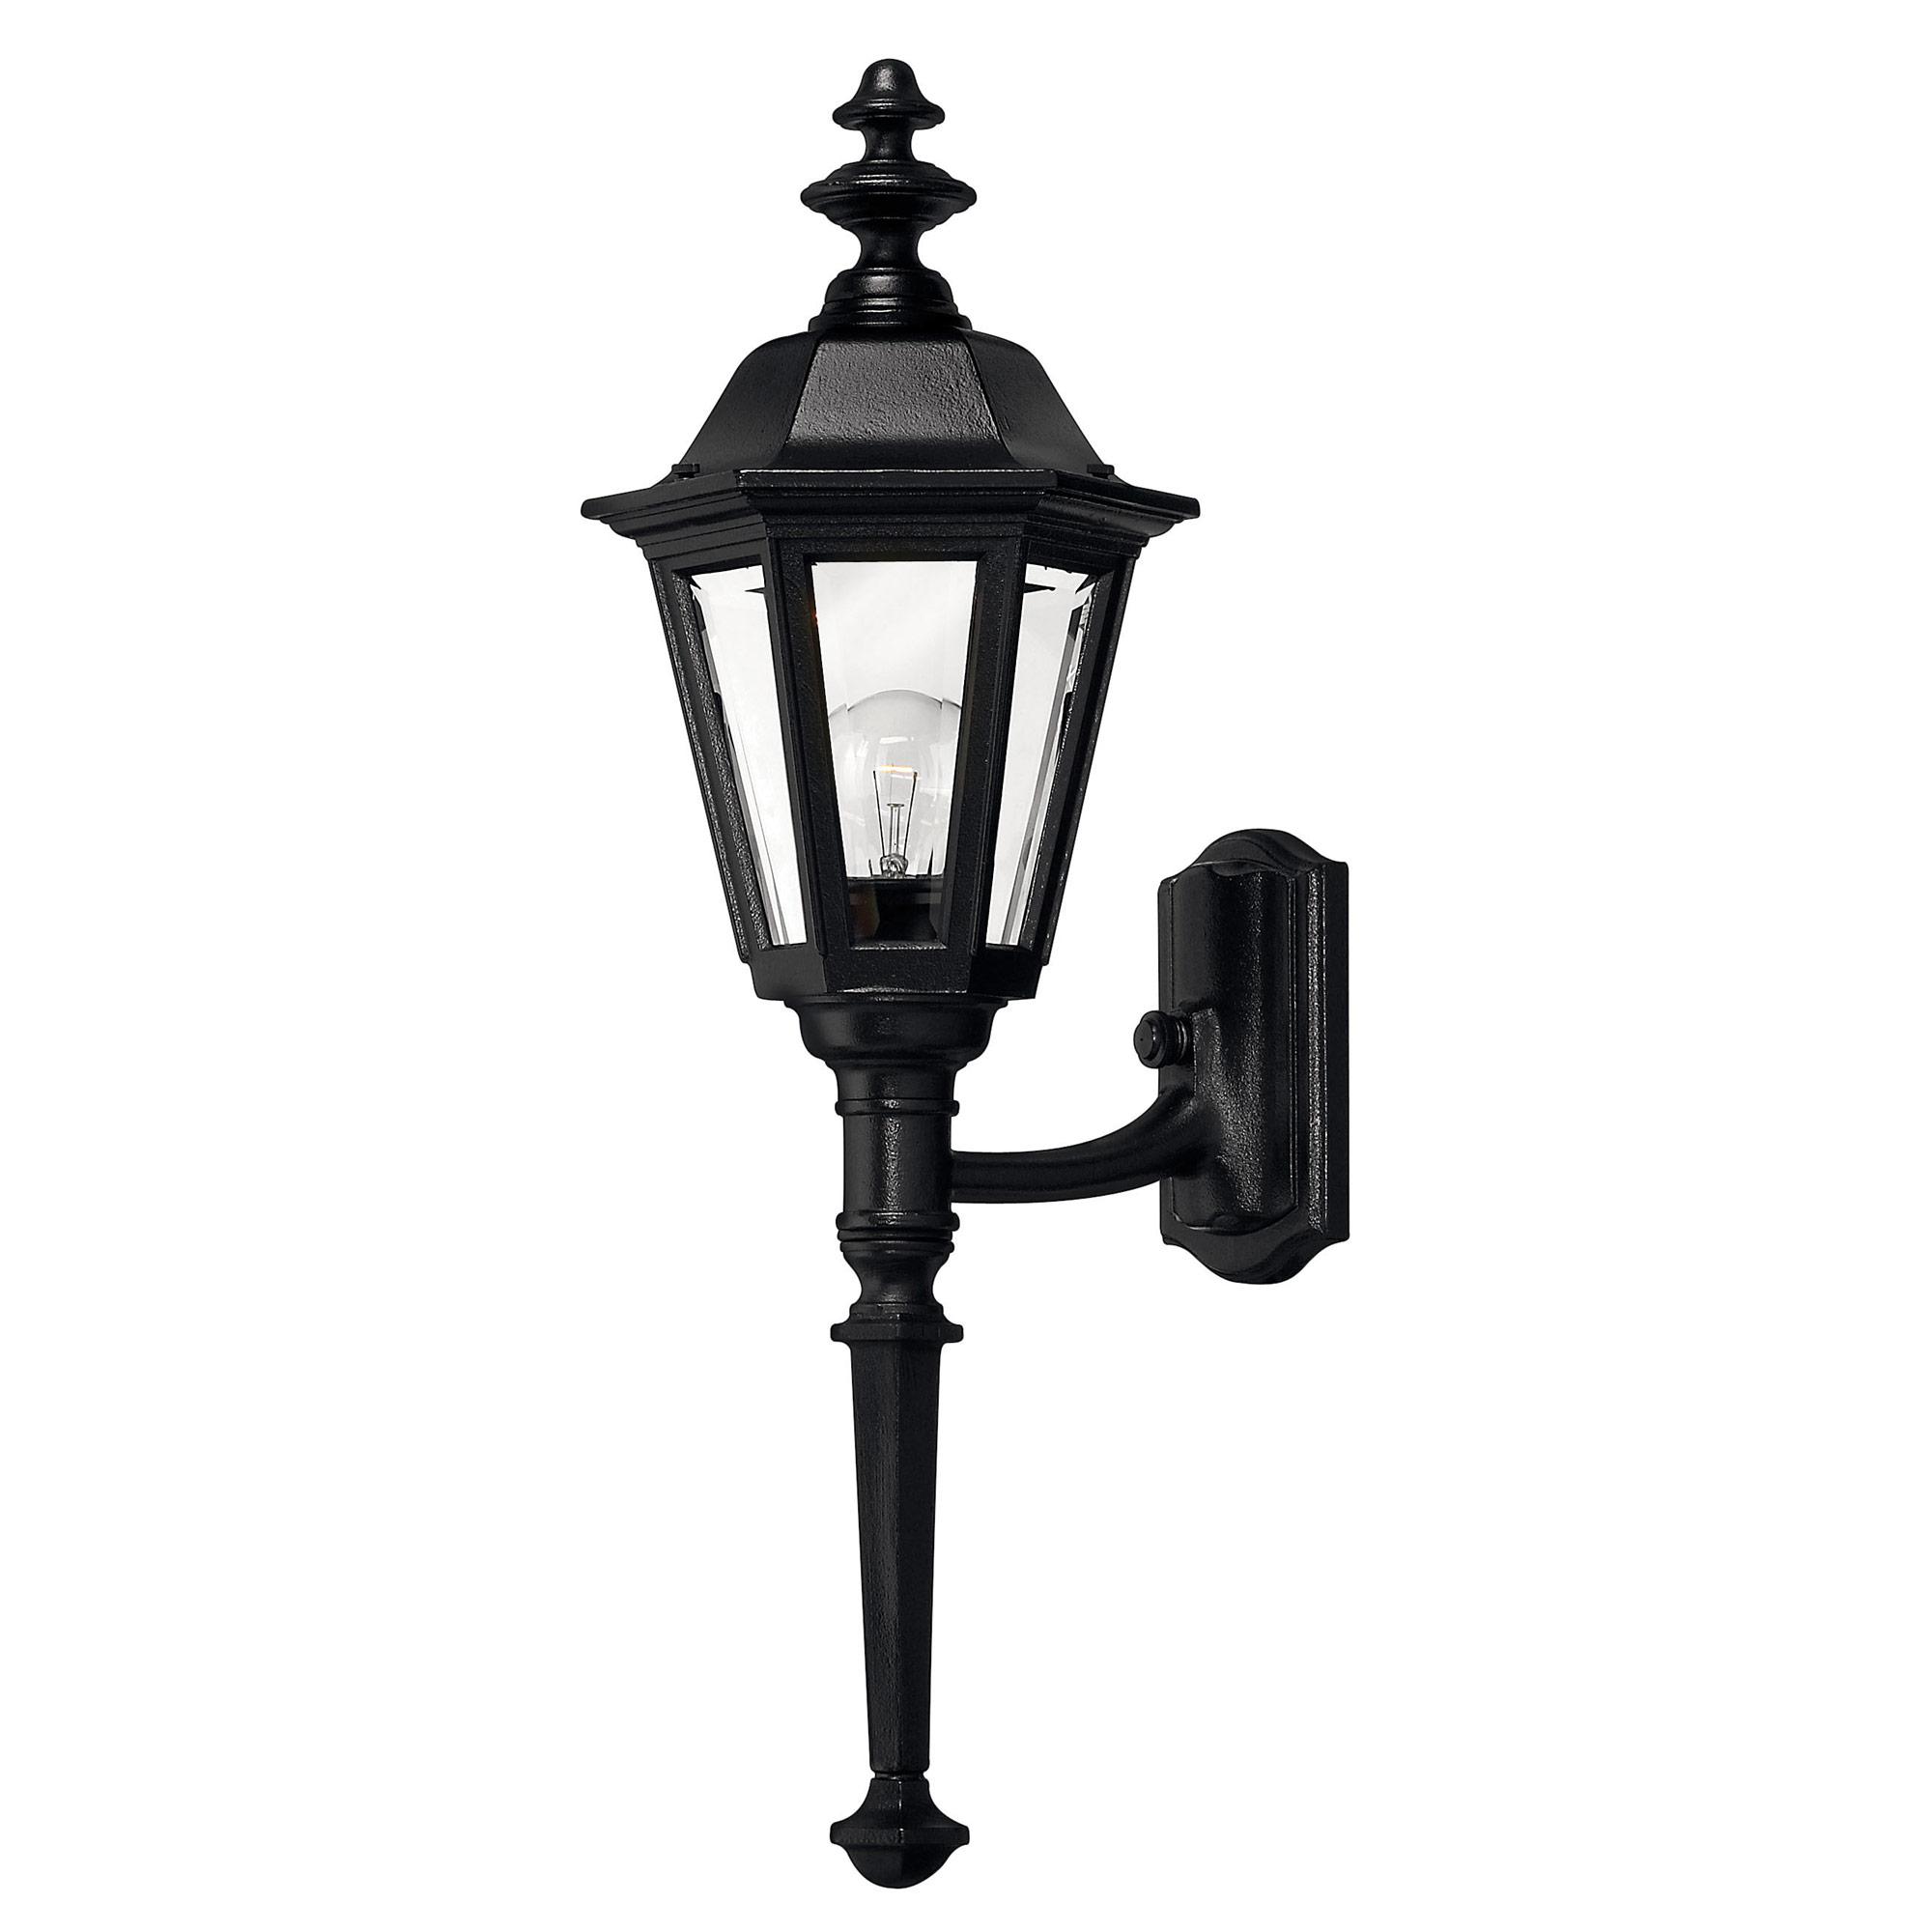 Manor House Long Stem Outdoor Wall Light By Hinkley Lighting 1410bk